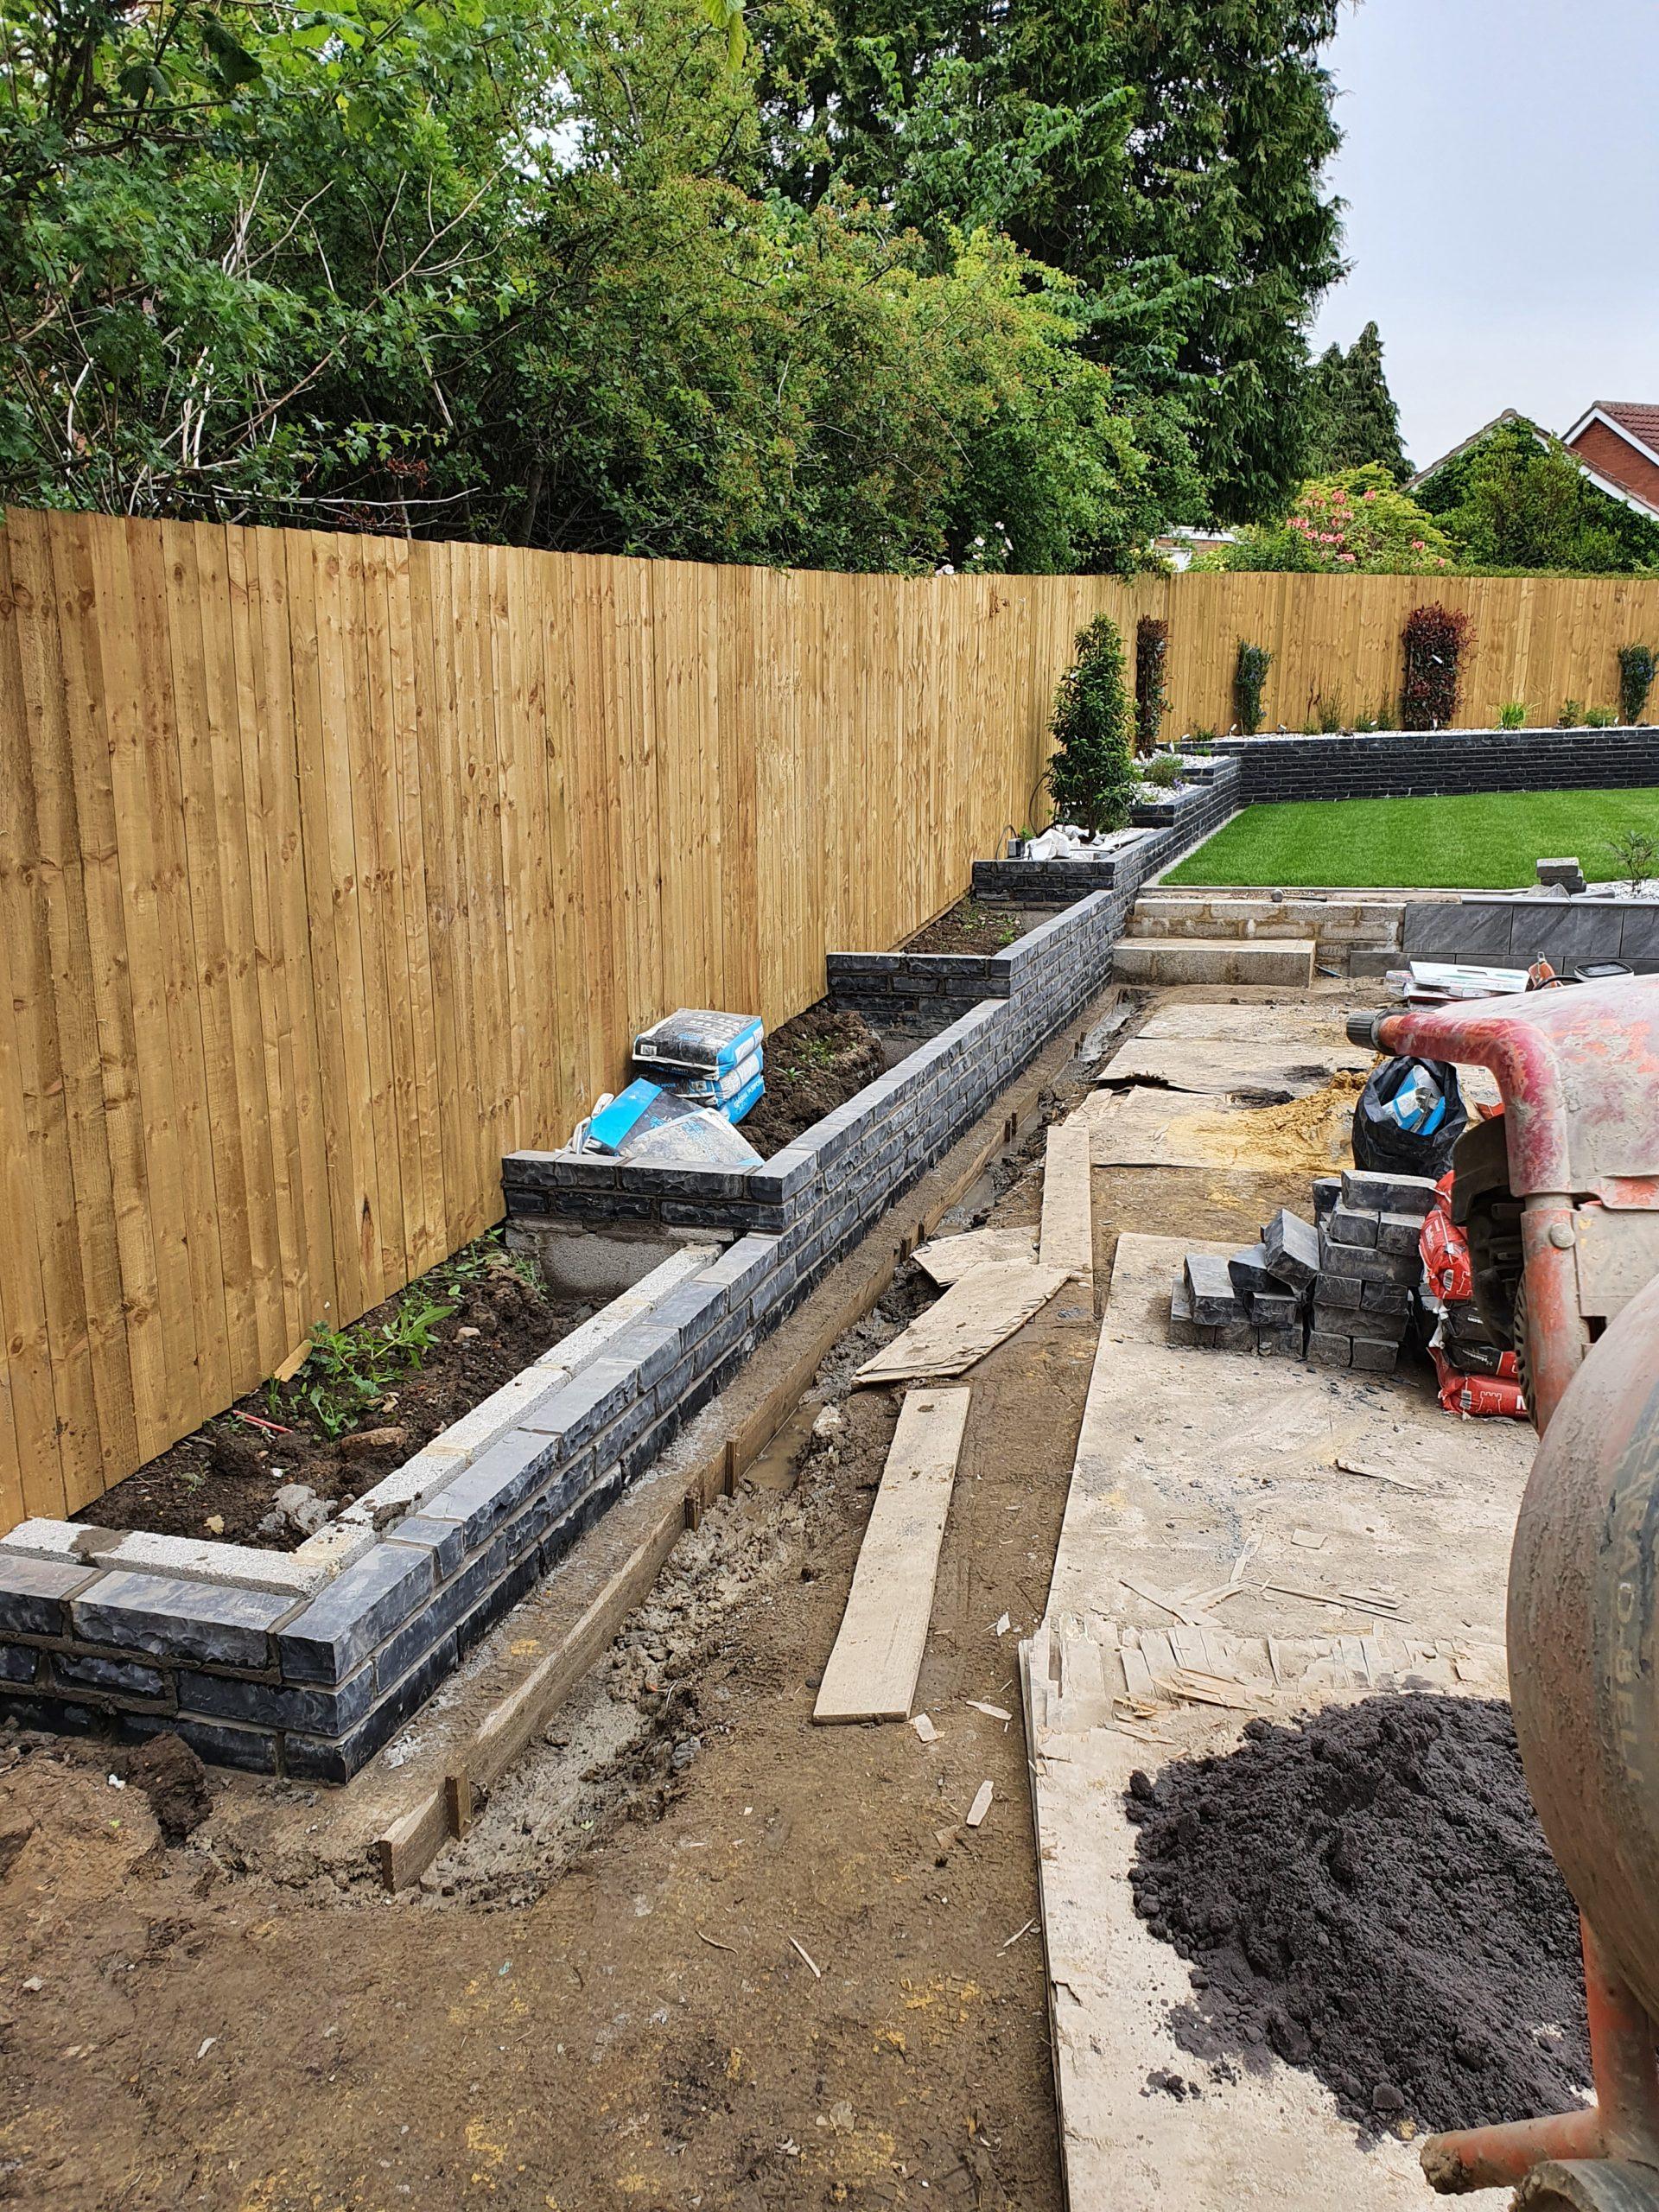 Garden work being completed